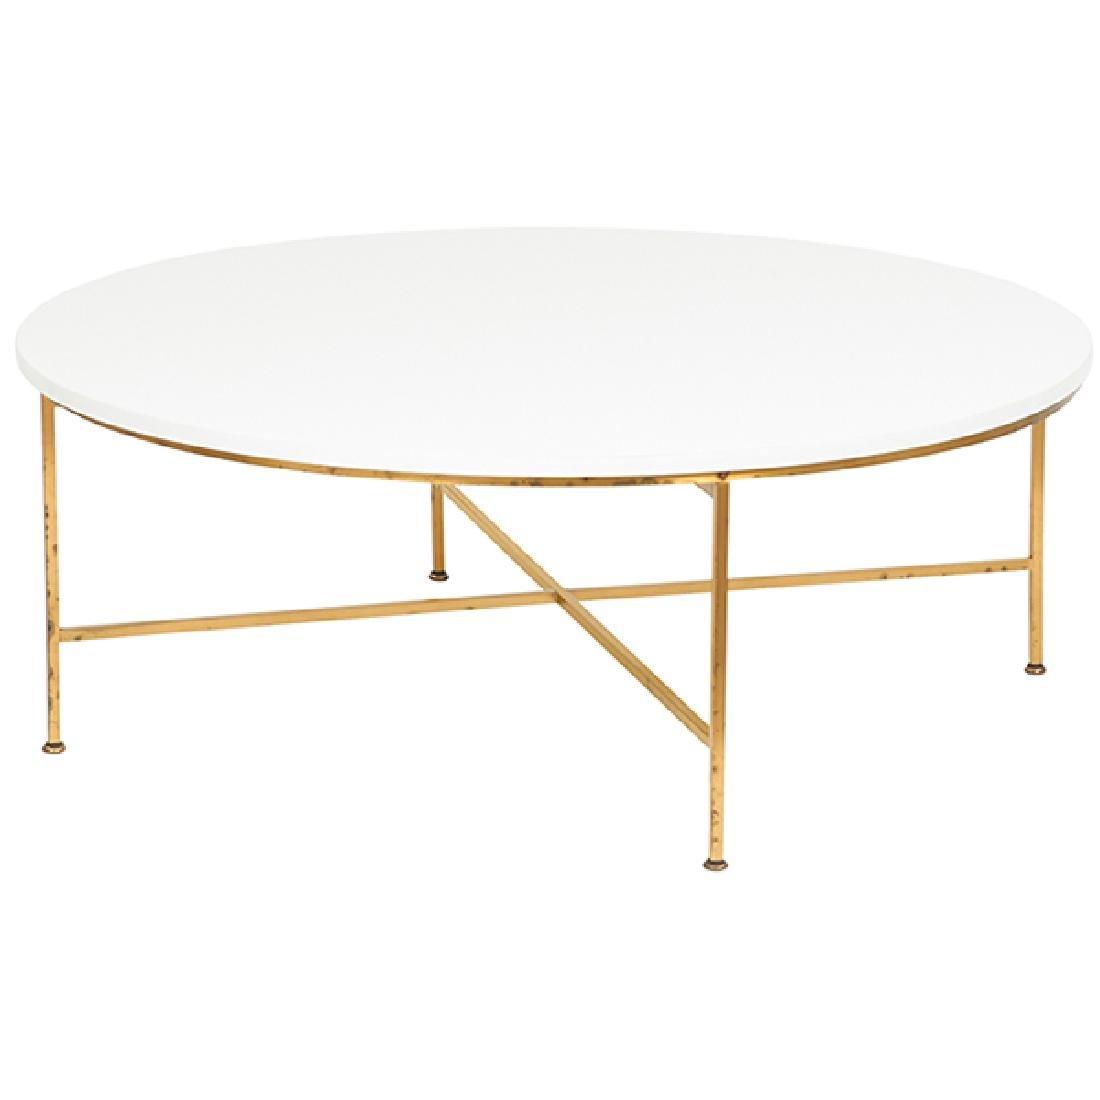 Paul McCobb (1917-1969) for Calvin coffee table, model